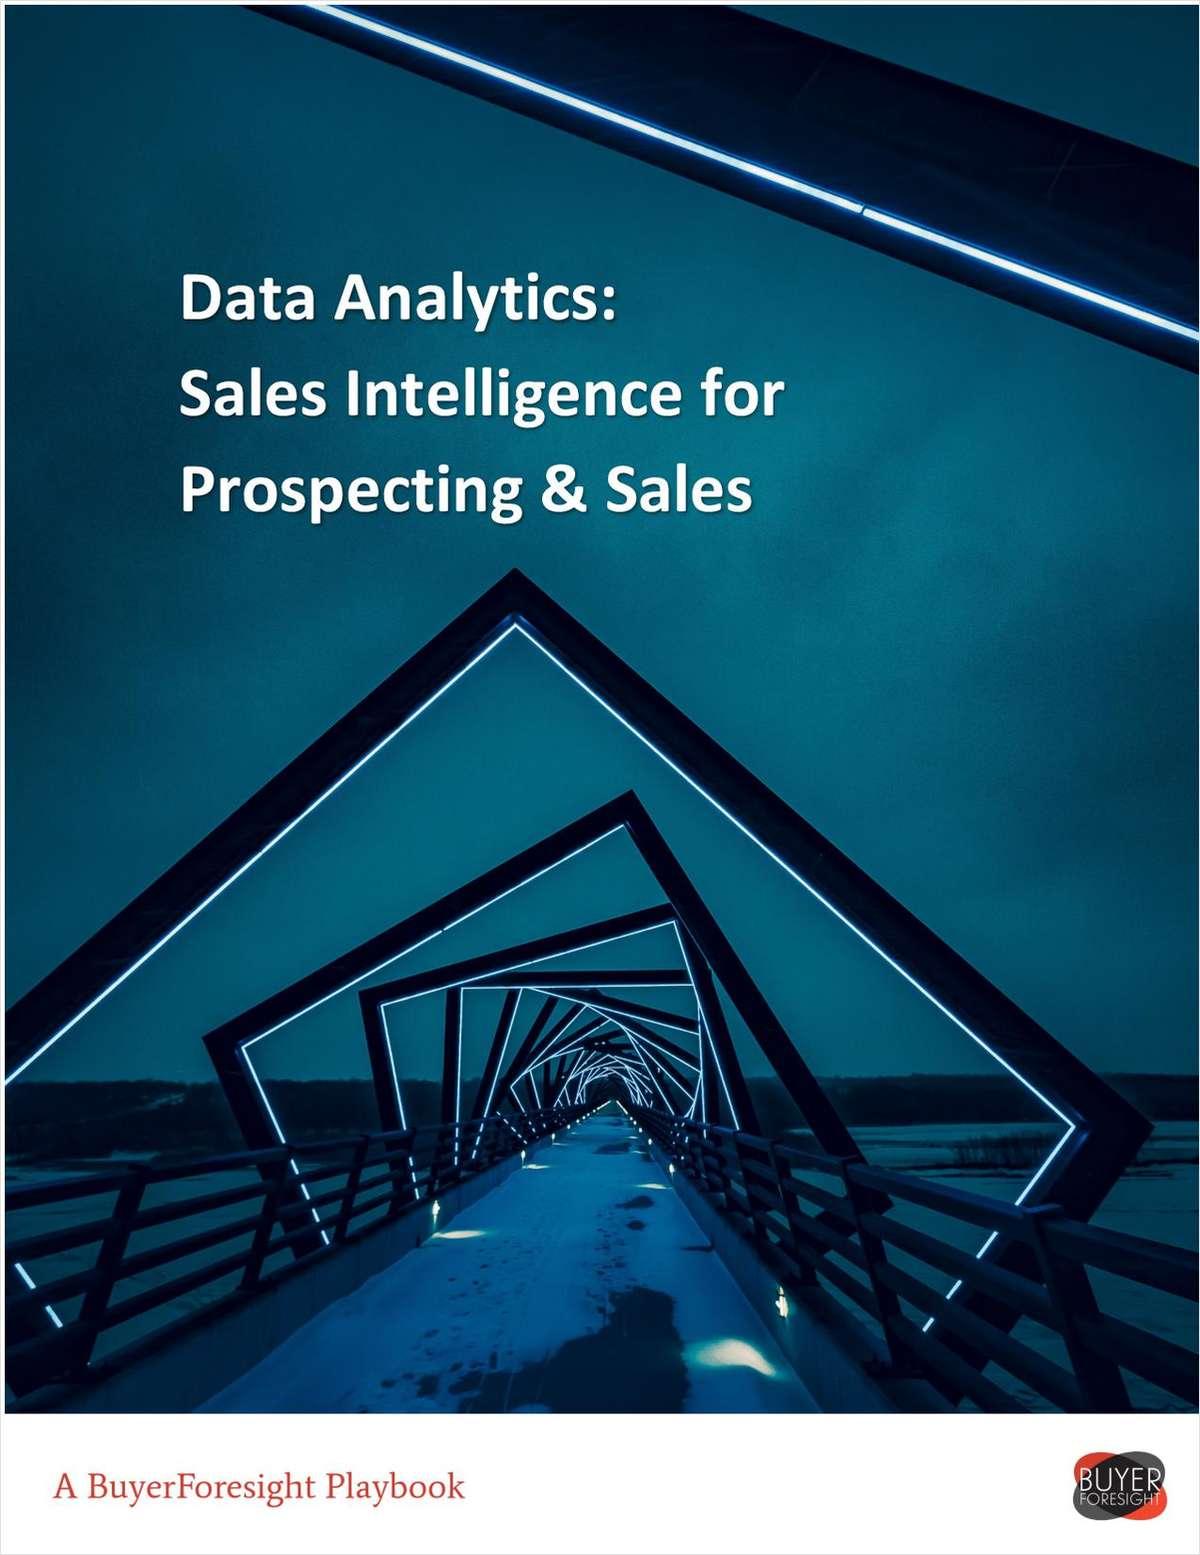 Sales Intelligence playbook for Data Analytics companies